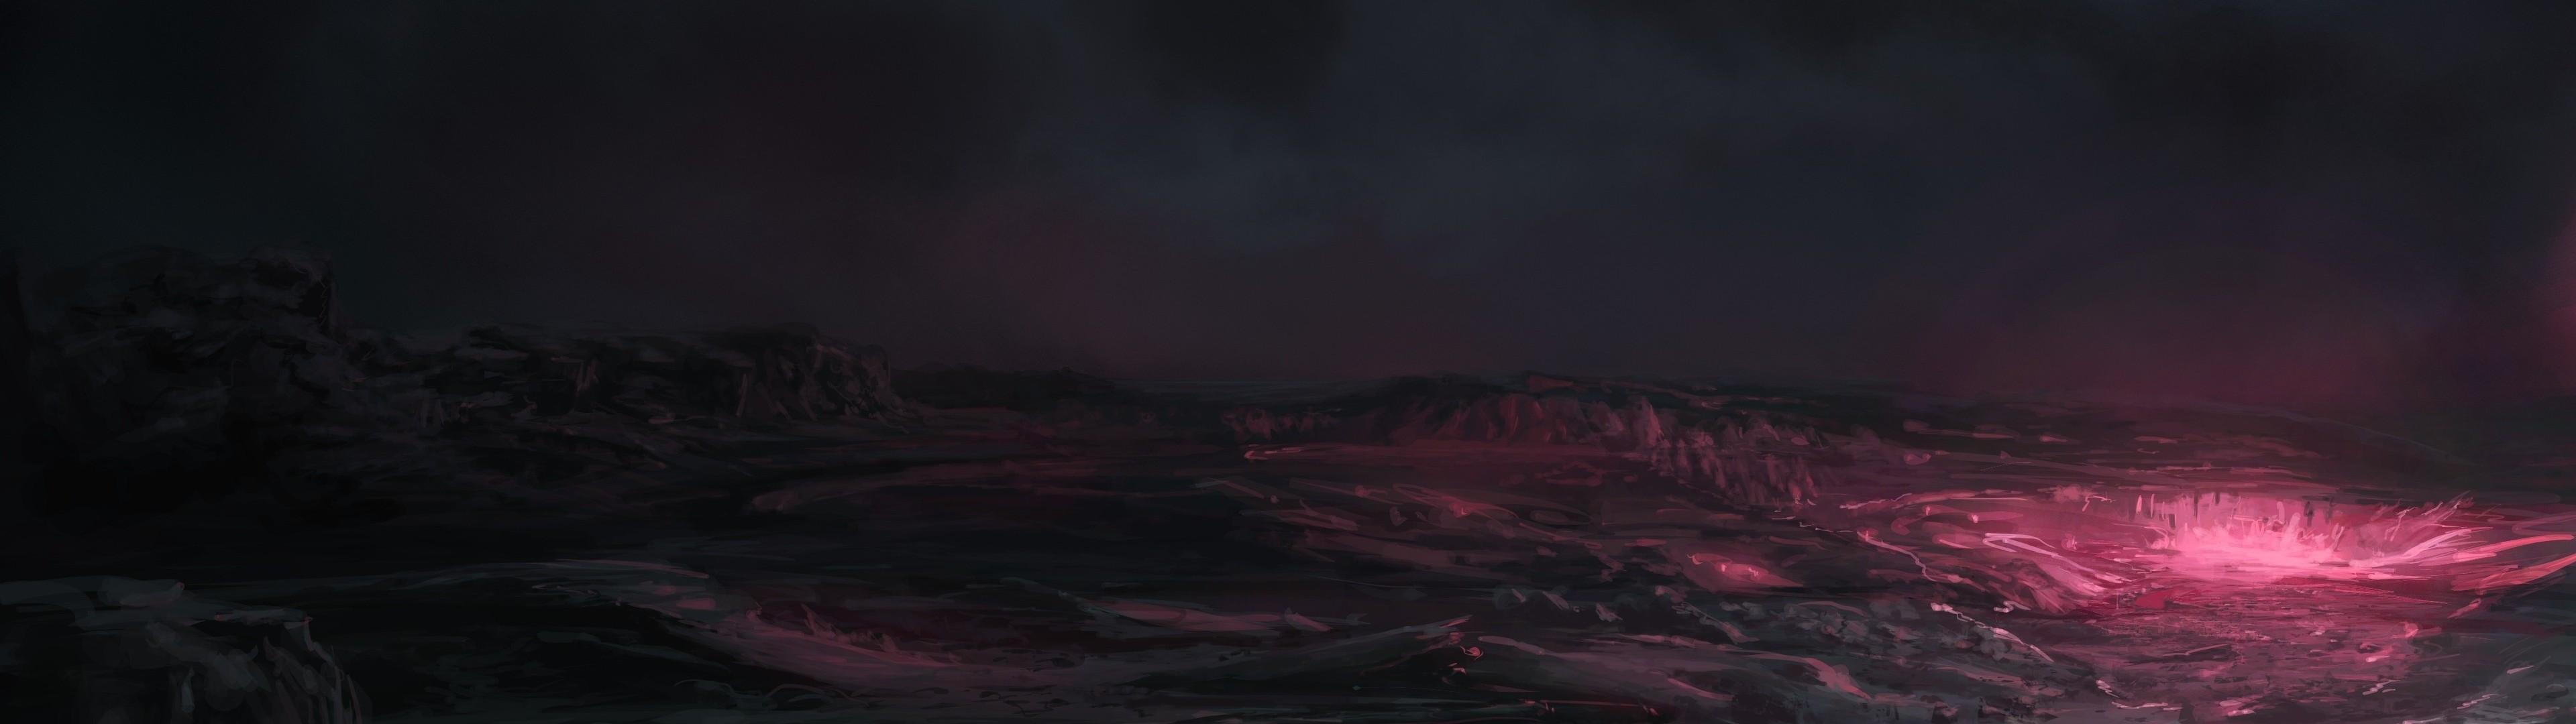 3840 X 1080 4k Backgrounds 3840x1080 Wallpaper Teahub Io